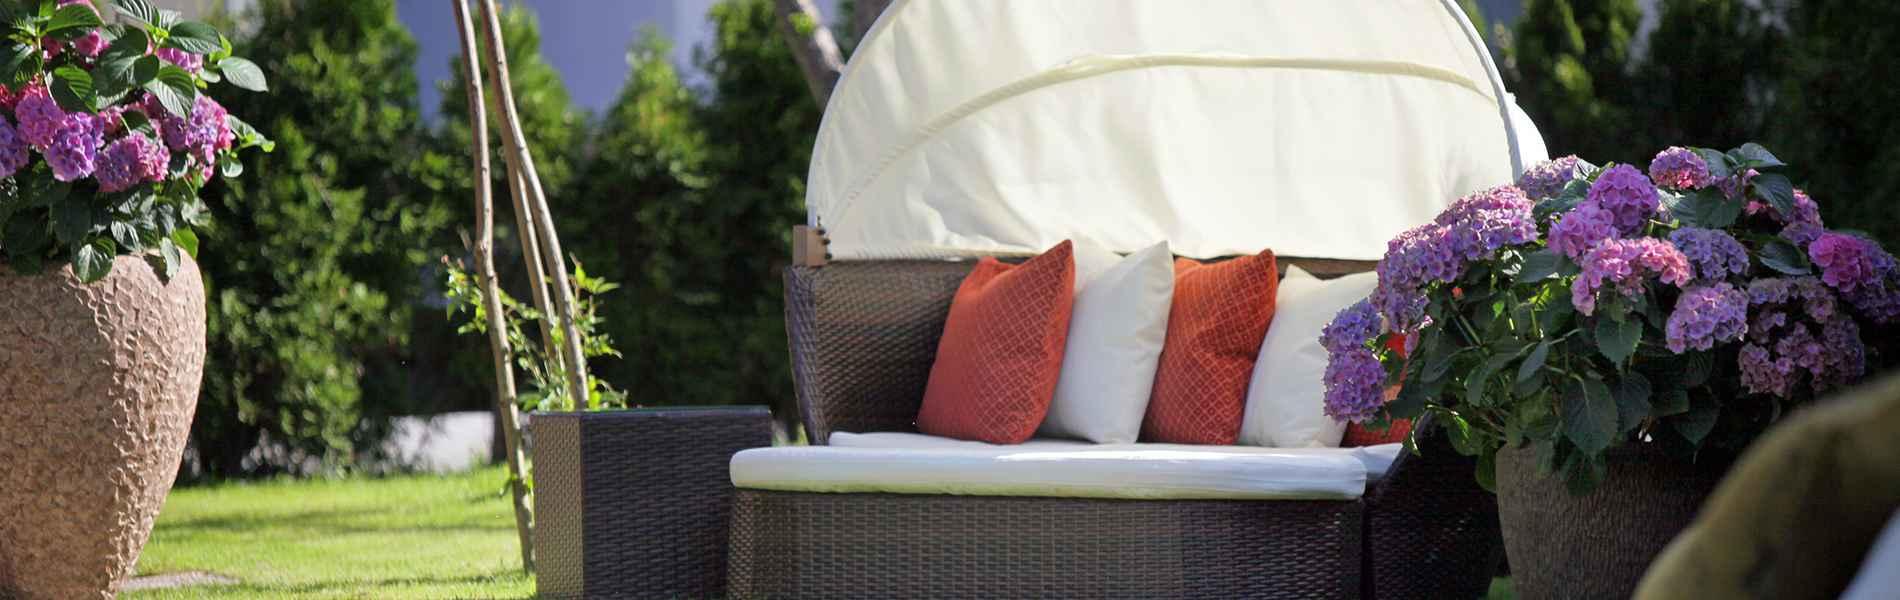 Relais Chateaux Hotel Restaurant Spa Rosengarten Kirchberg Tirol 5-Sterne Lifestyle Hotel Wellnessurlaub